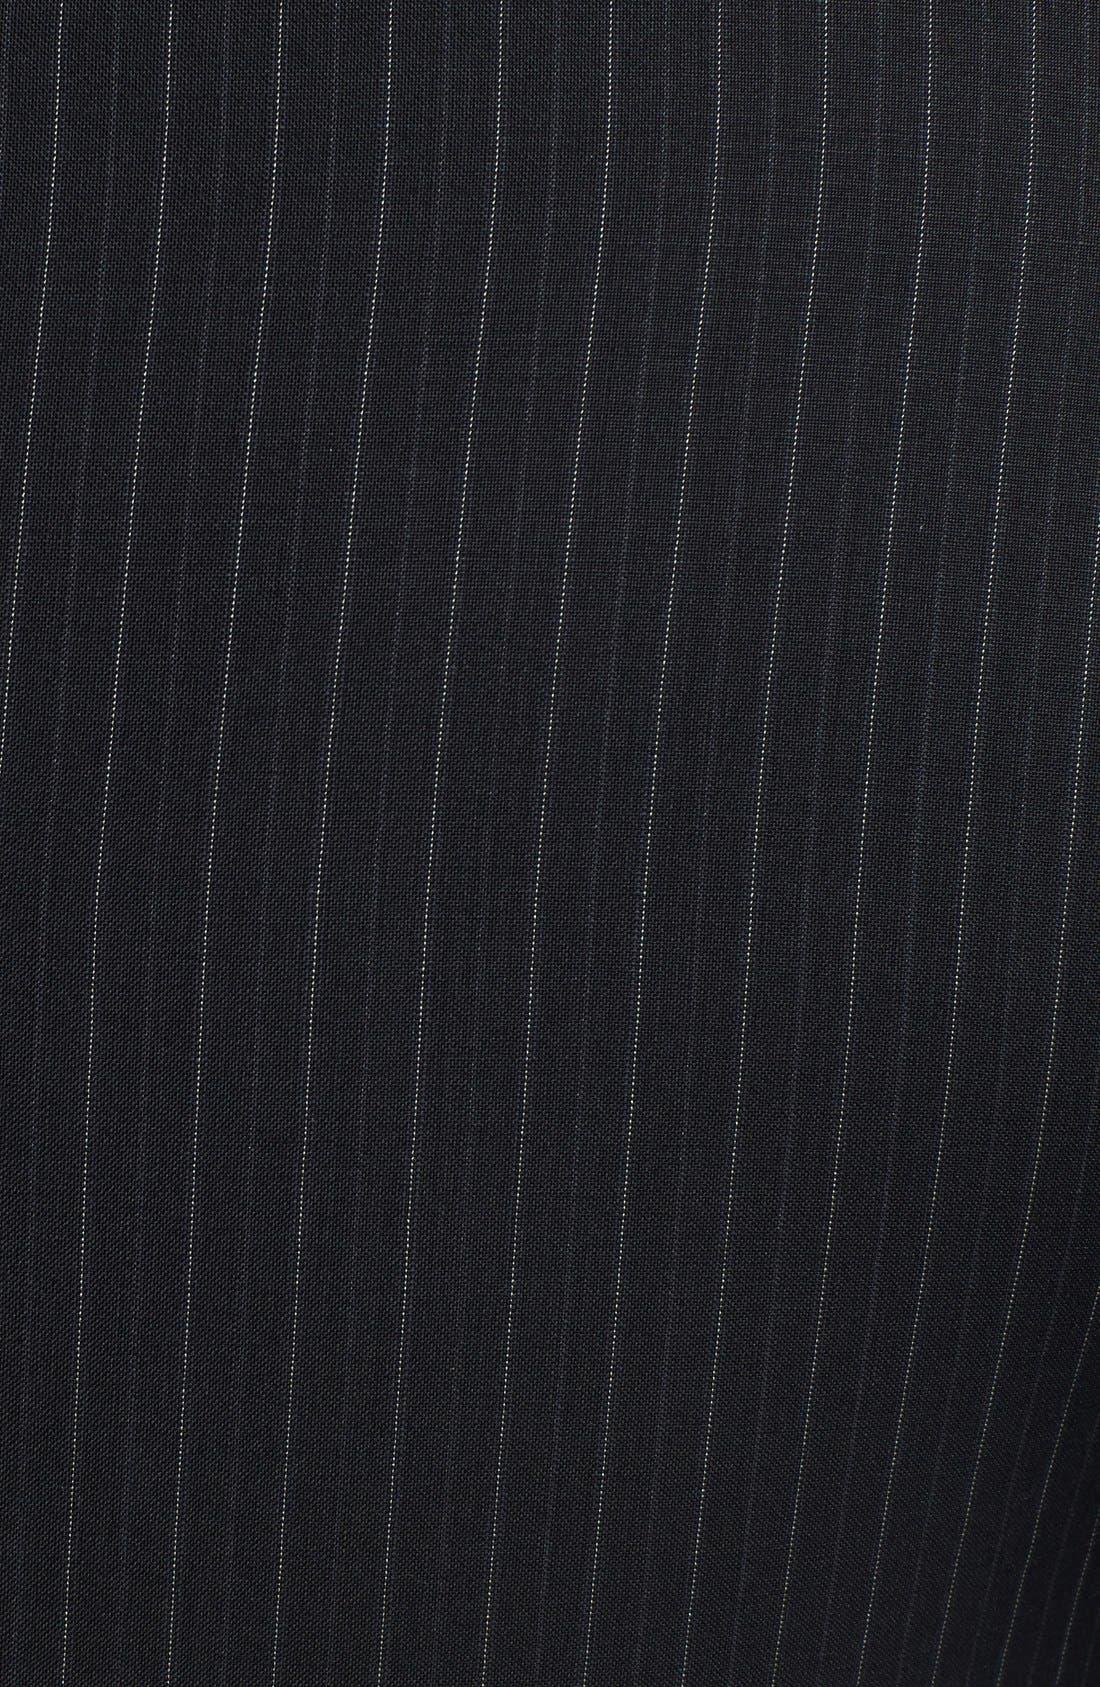 Alternate Image 5  - Dolce&Gabbana 'Martini' Black Stripe Wool Suit